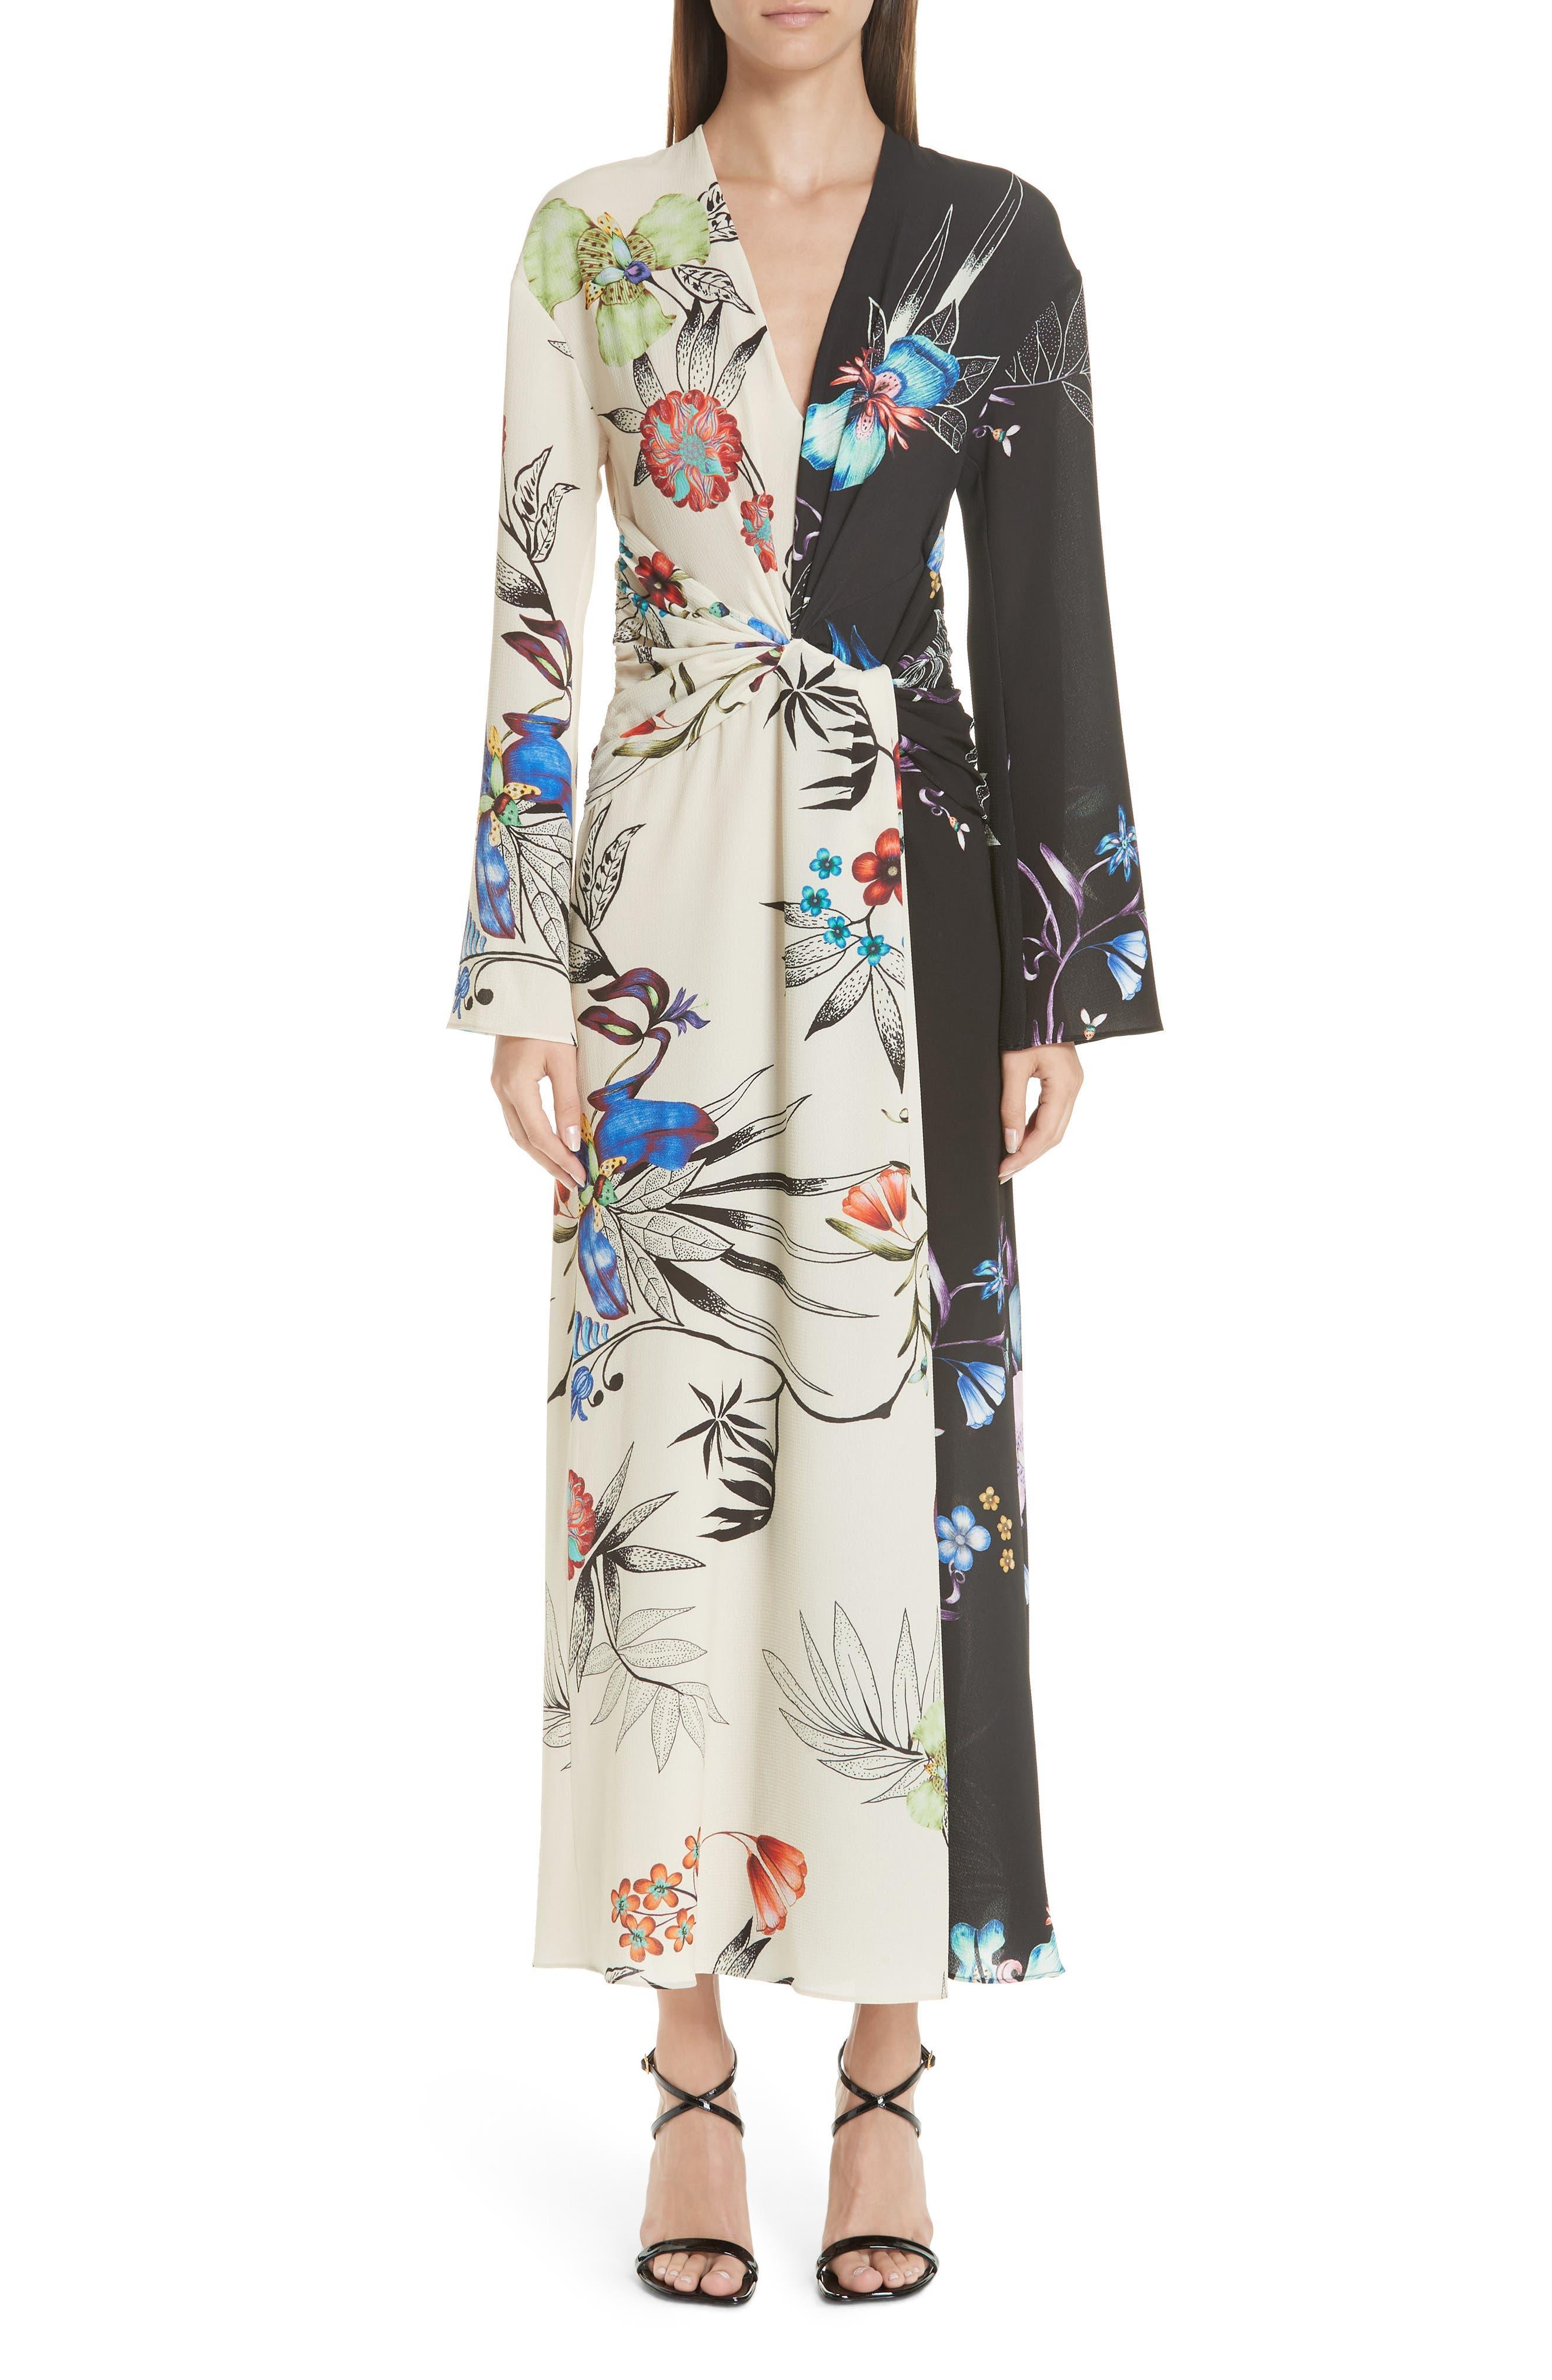 Etro Floral Print Two-Tone Dress